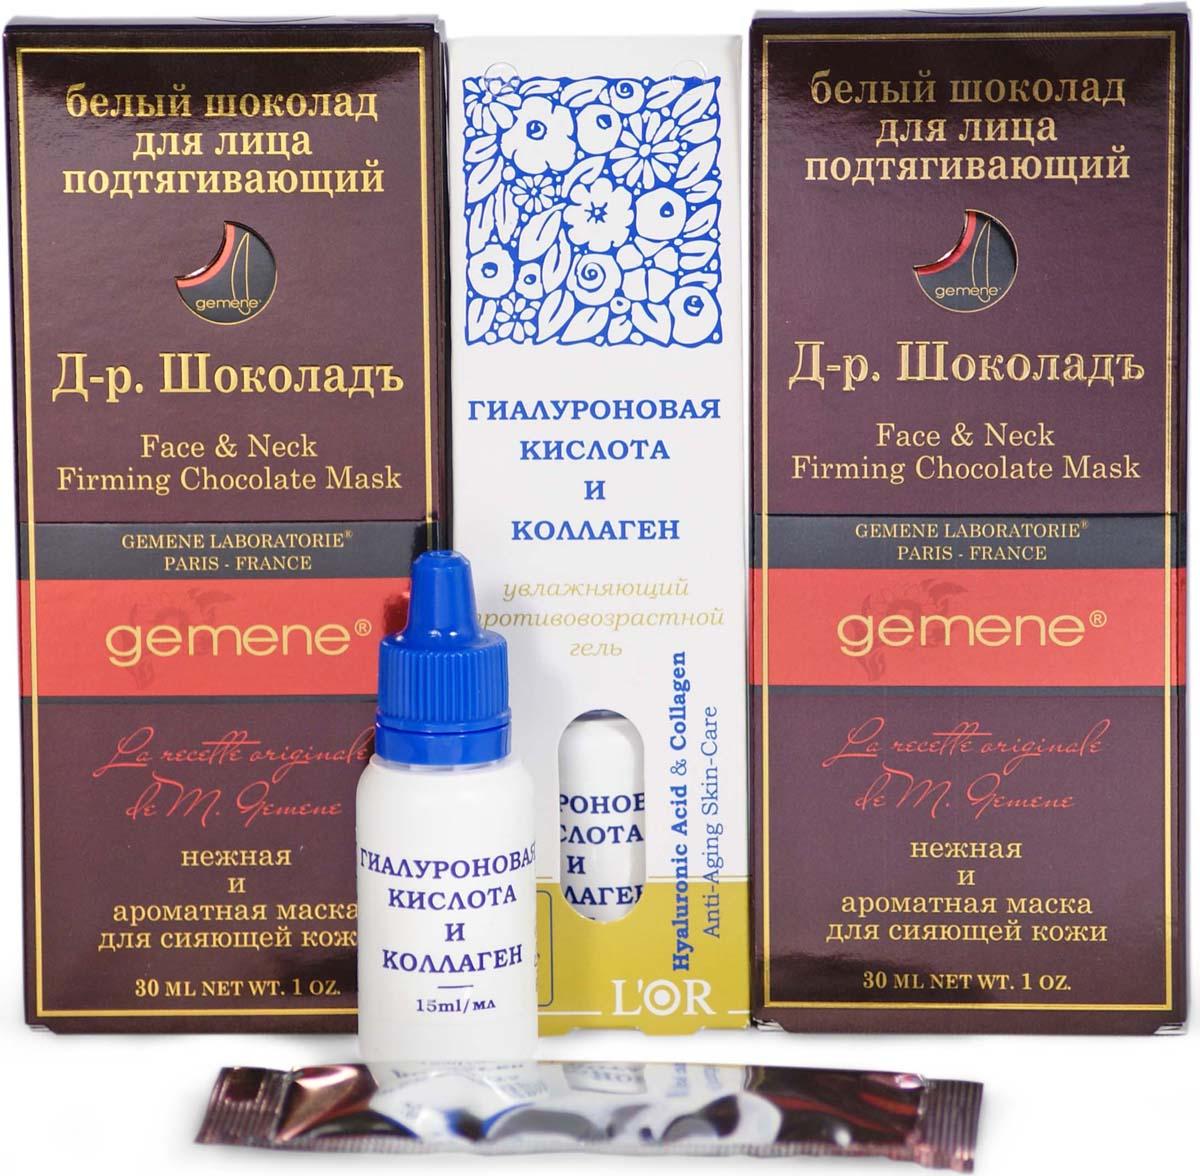 Gemene Набор: Масло косметическое Шоколад для лица подтягивающий, 4 х 7,5 мл, 2 шт, Гиалуроновая кислота и Коллаген L'Or, 15 мл гиалуроновая кислота 12 мл gemene